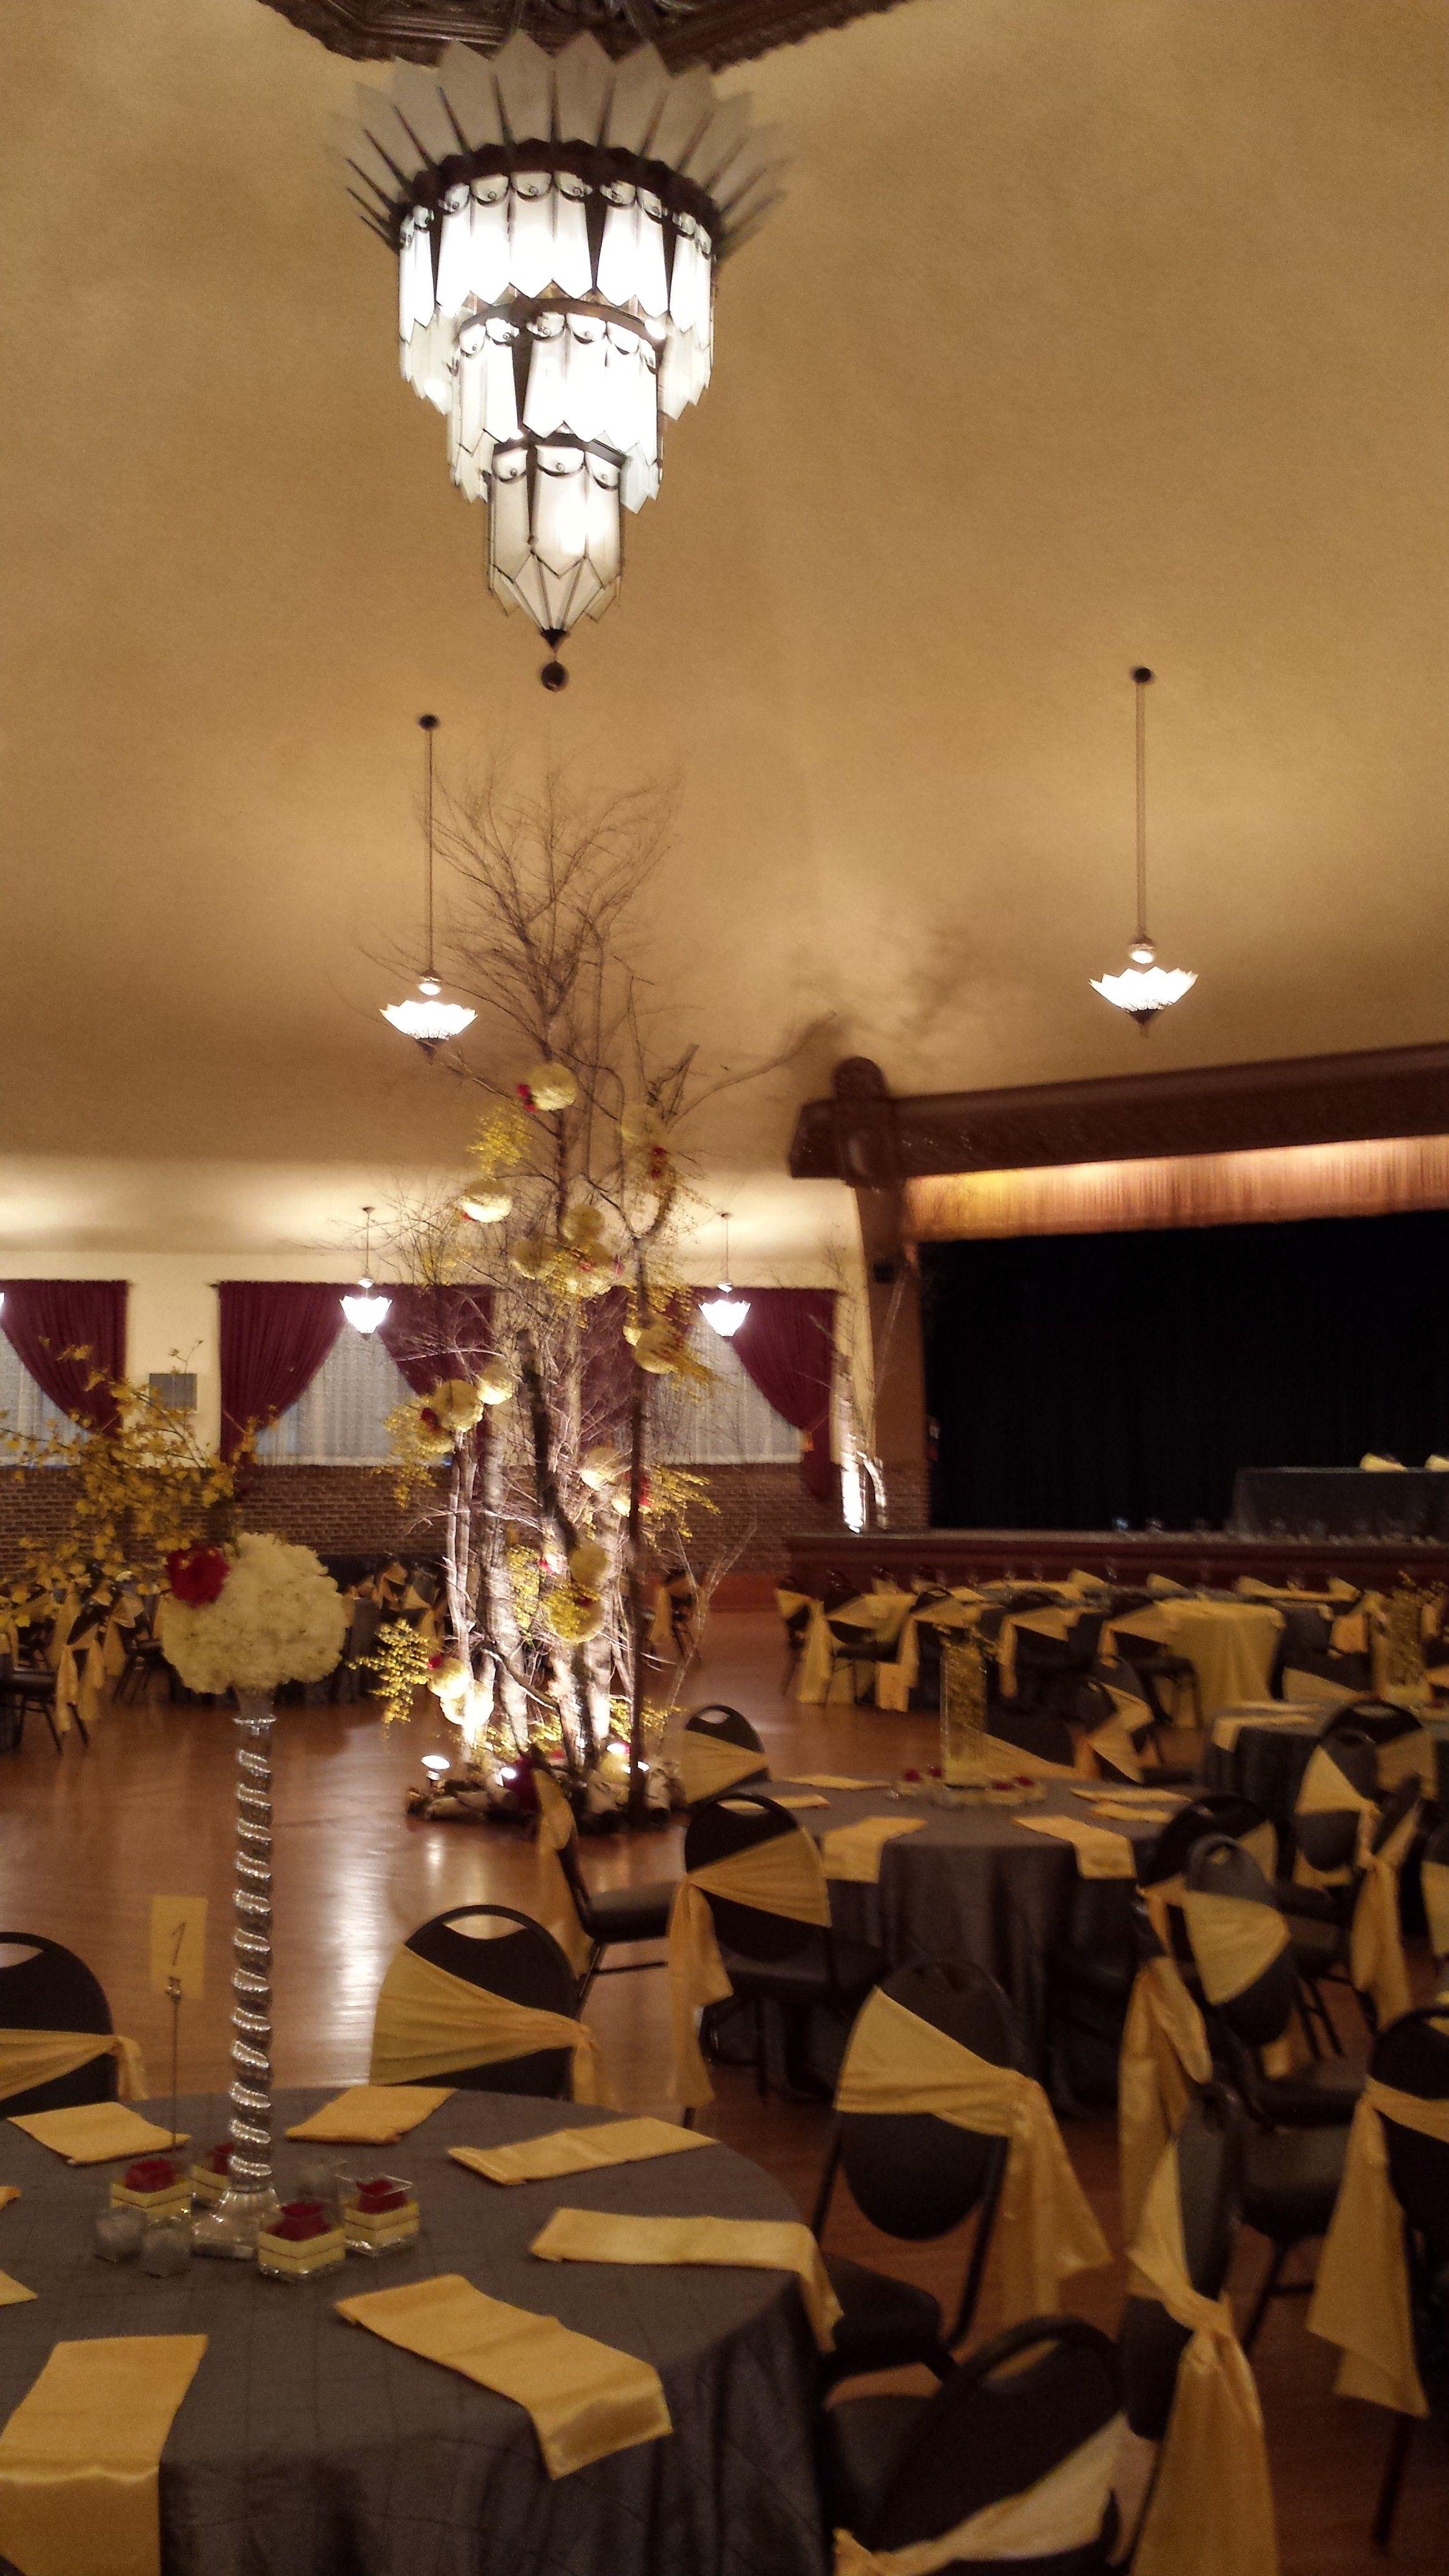 Yellow wedding at the chandelier ballroom chandelier ballroom yellow wedding at the chandelier ballroom arubaitofo Choice Image